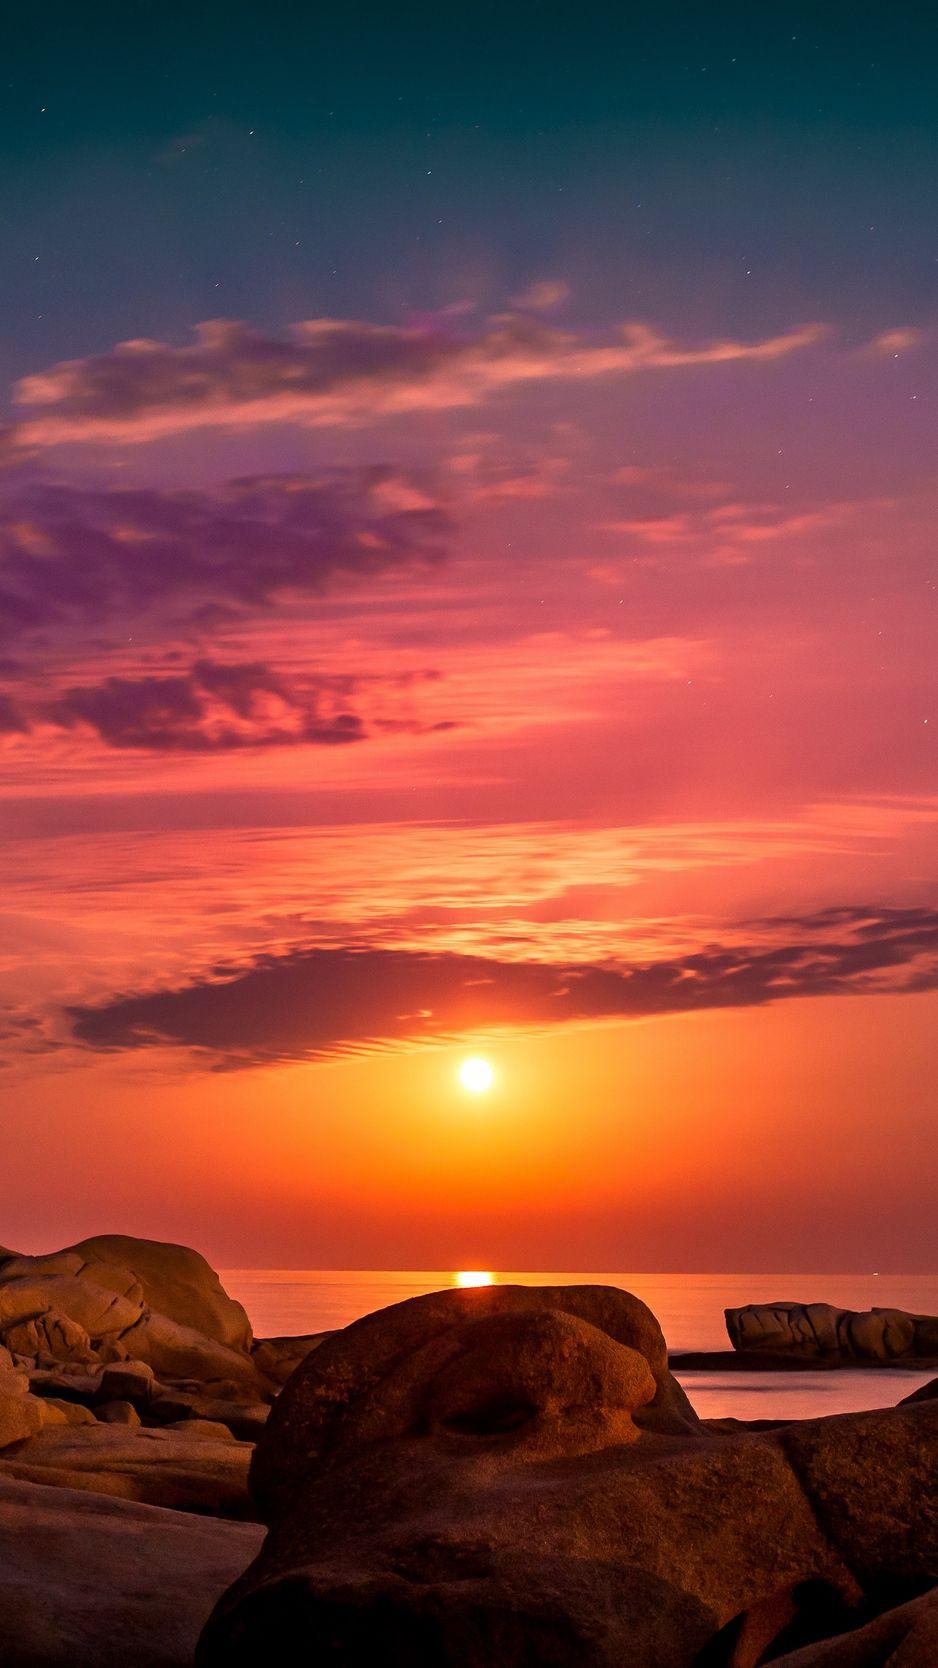 Sea Rocks Sunset Sky Spain Wallpaper Sunset Wallpaper Sunset Wallpaper Iphone Spain Wallpaper